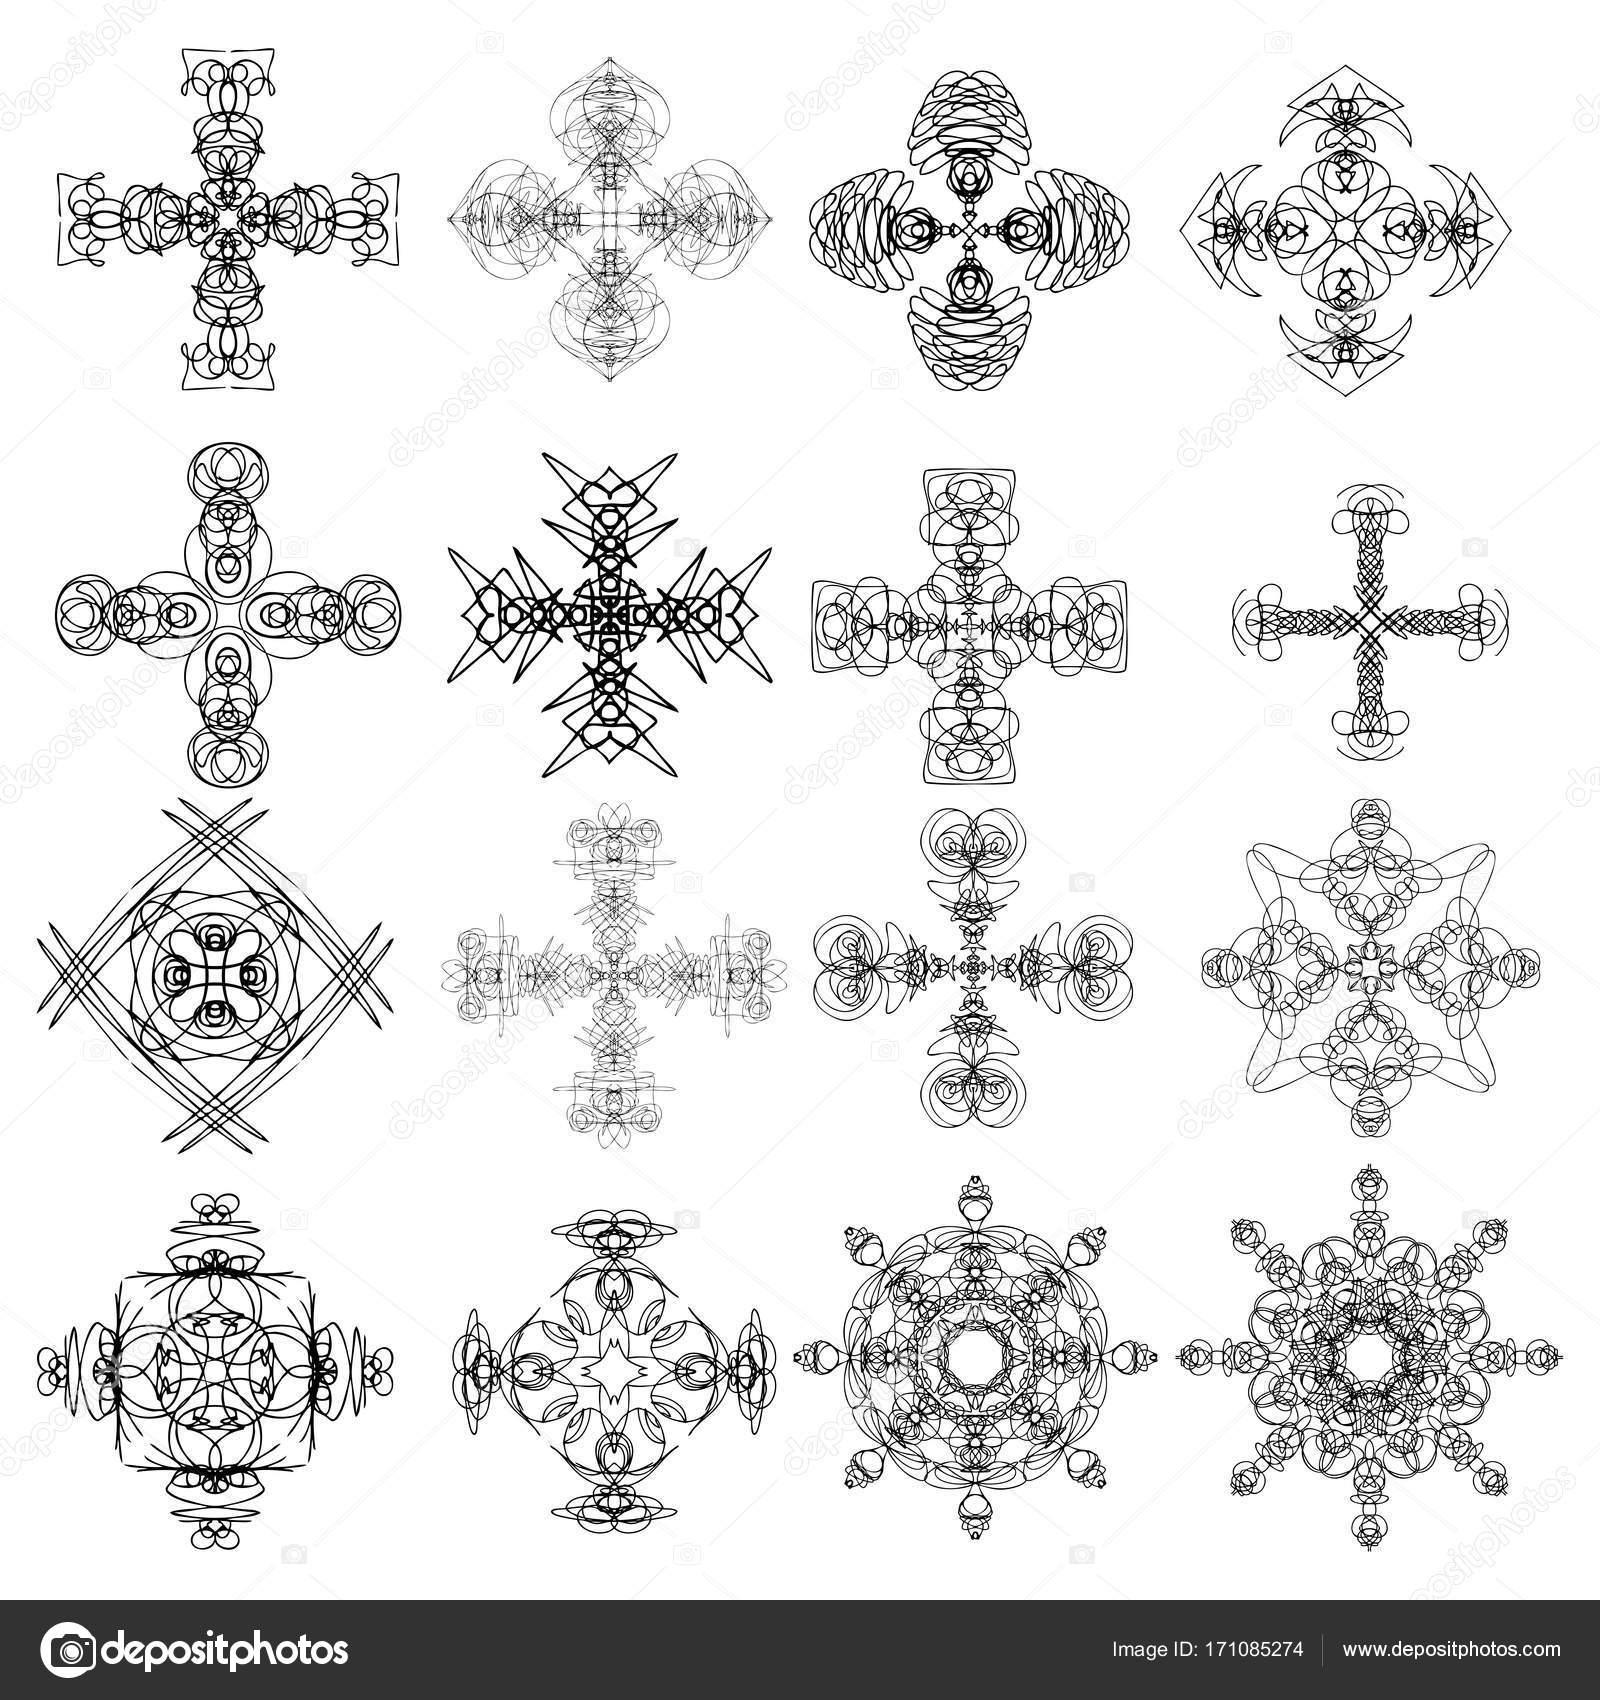 Tatuajes Indios Simbolos Caleidoscópica Mandala Inspirado